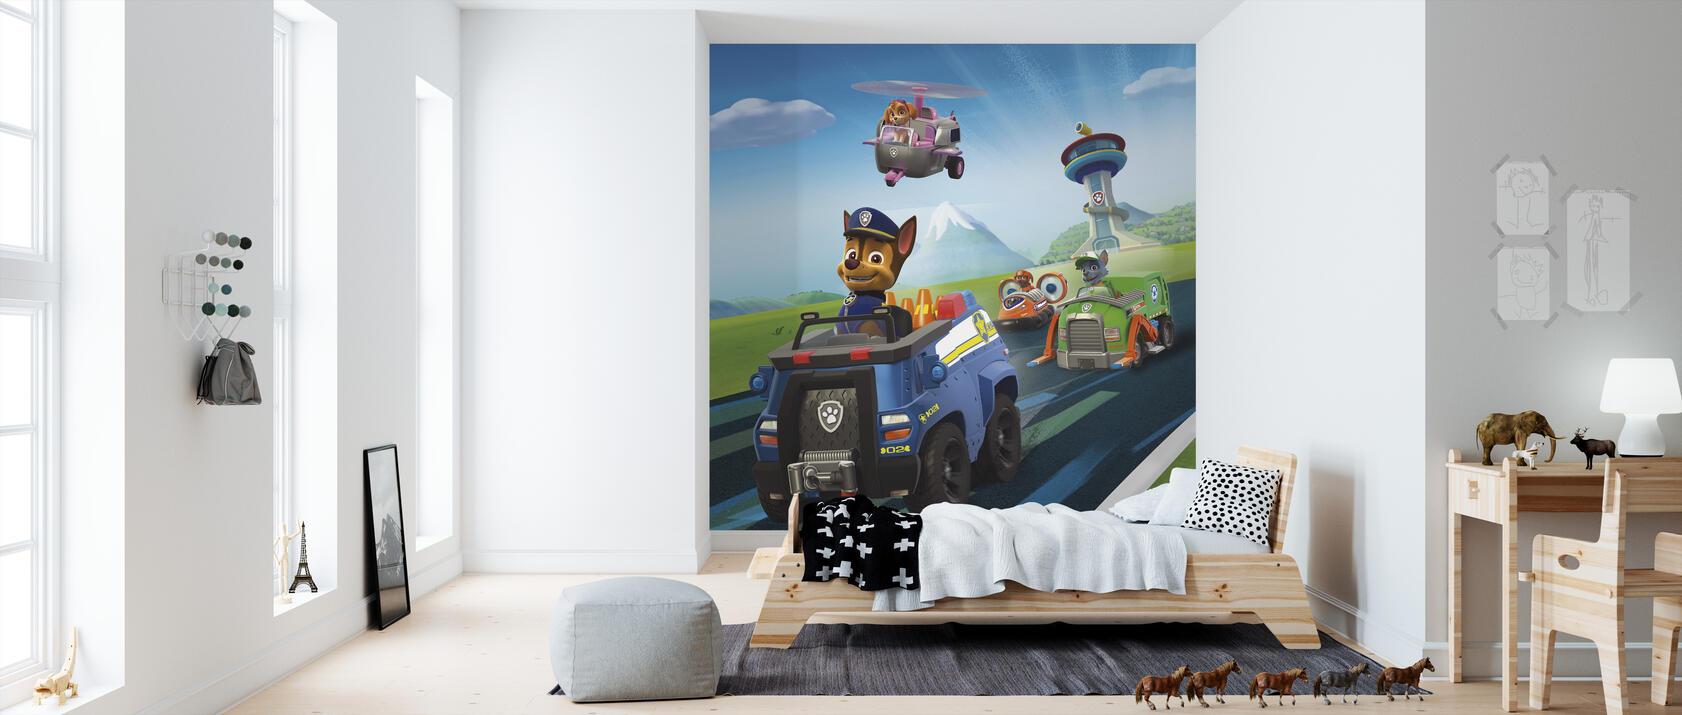 paw patrol let 39 s roll kostenlos gelieferte fototapete von h chster qualit t photowall. Black Bedroom Furniture Sets. Home Design Ideas